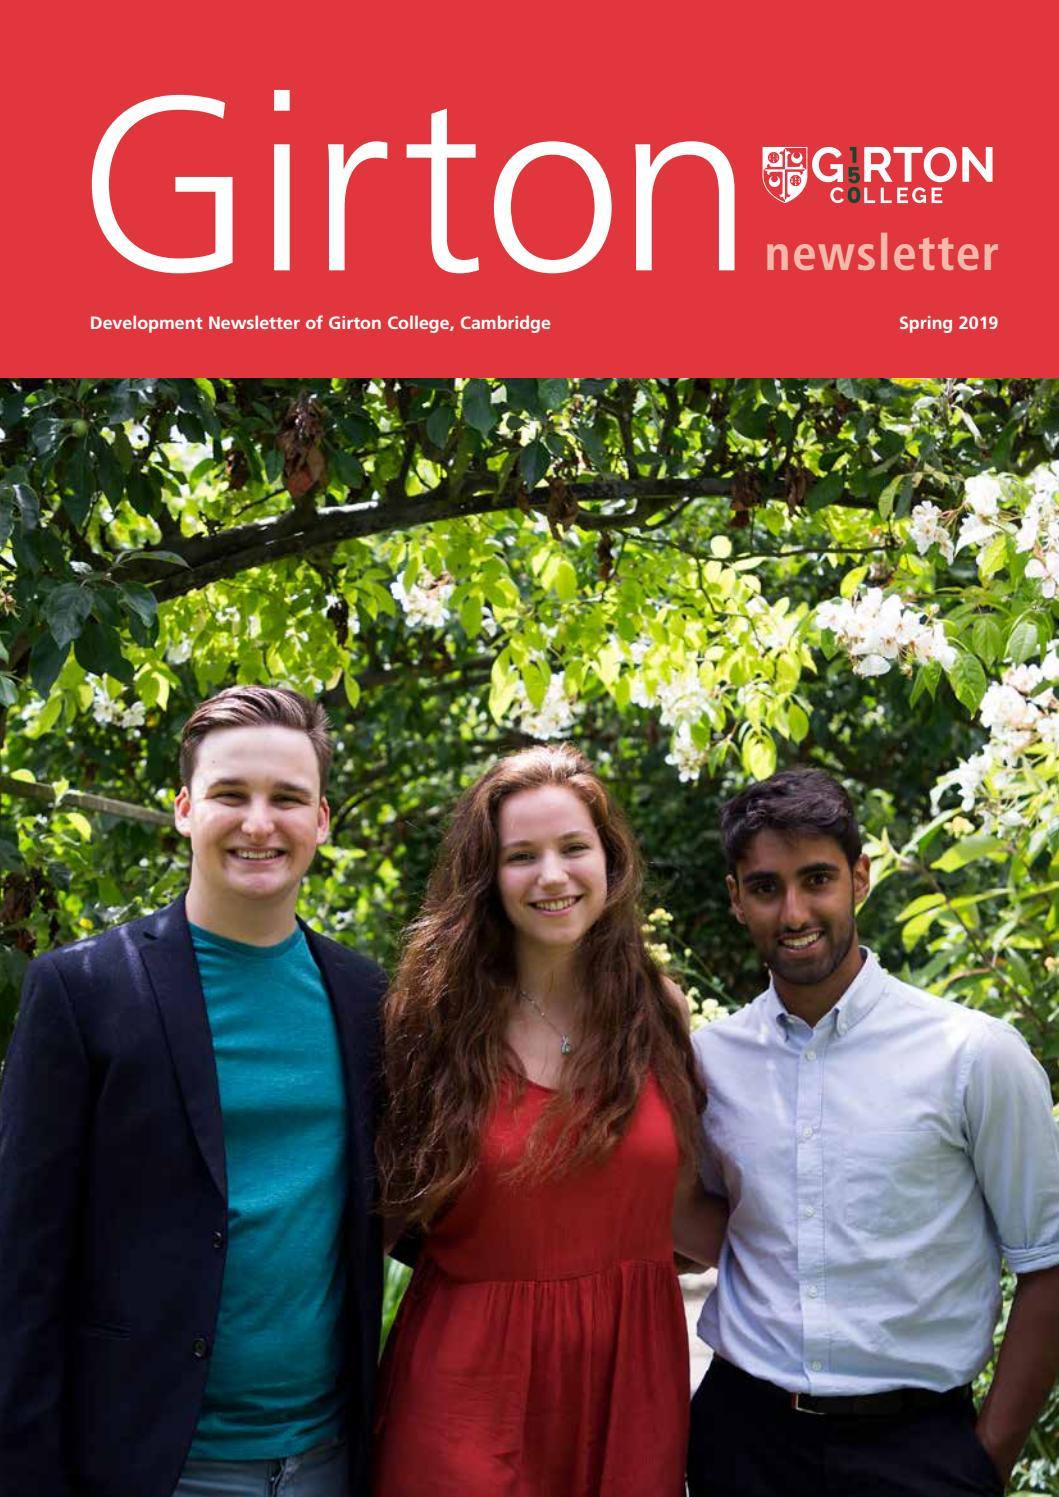 Girton College Newsletter 2019 by Girton College - issuu